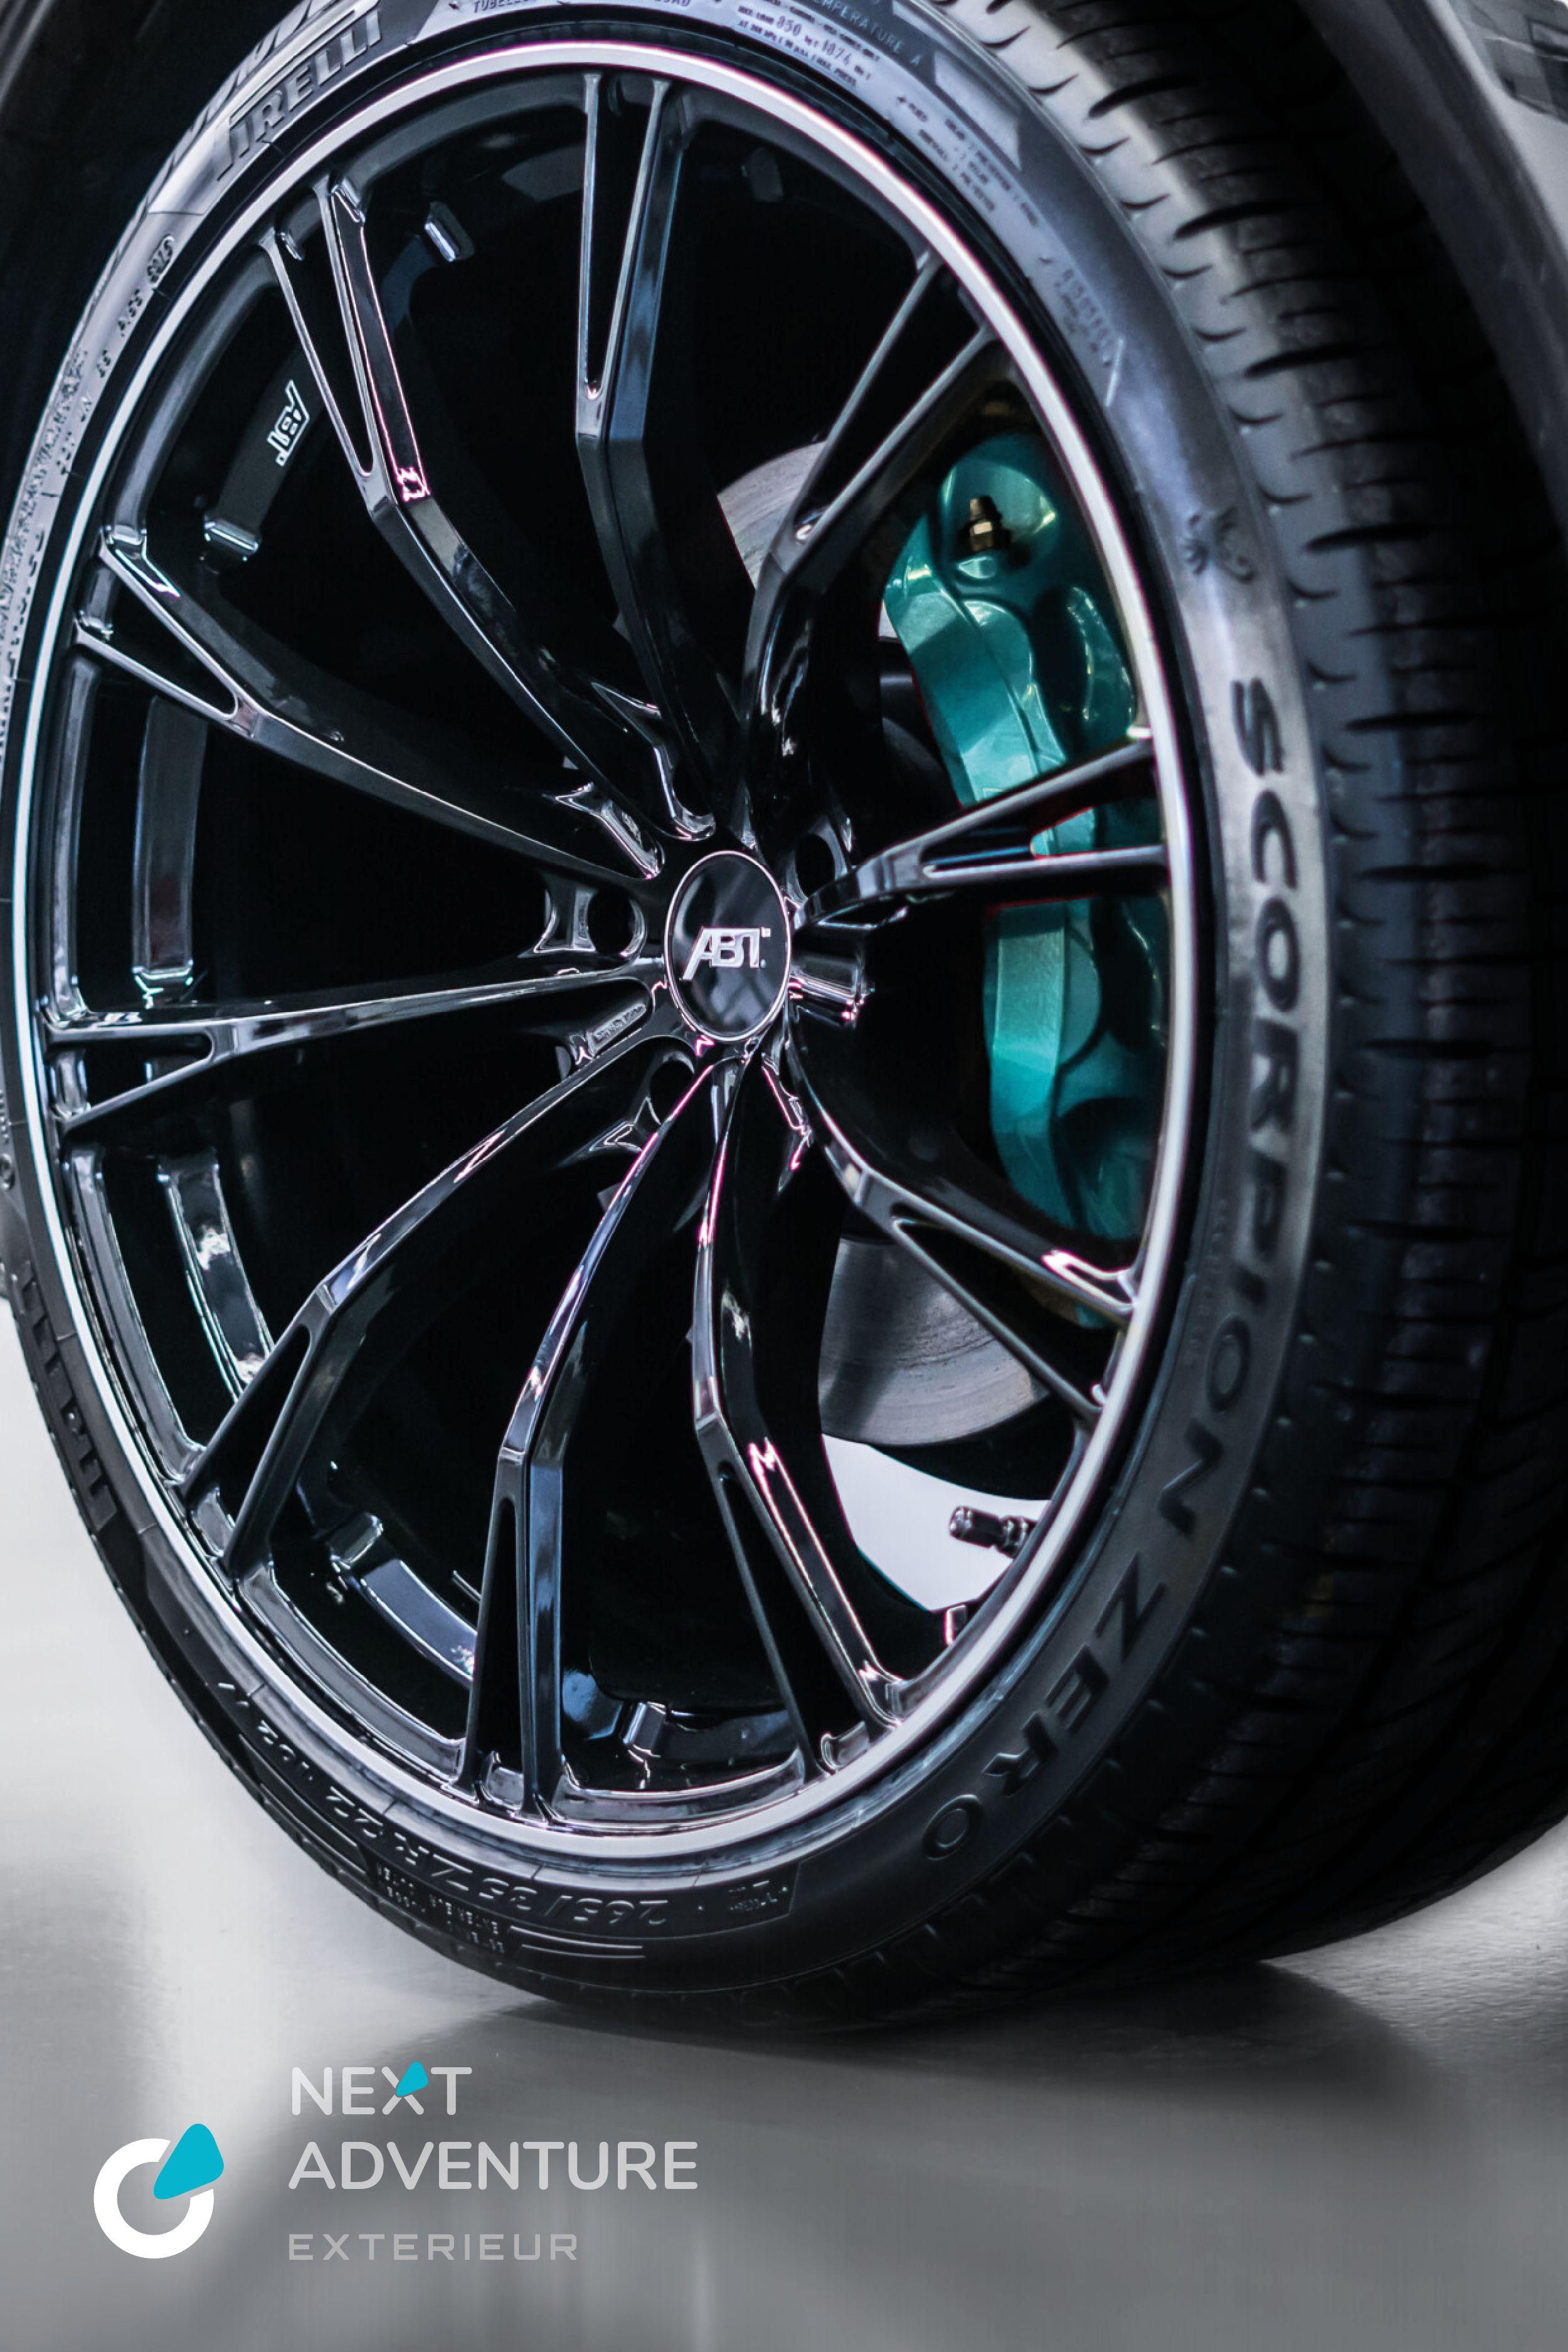 Abt Sport Gr20 Glossy Black Felgensatz Bremssattel In Individualfarbe Vw T6 Volkswagen Autoaufbereitung